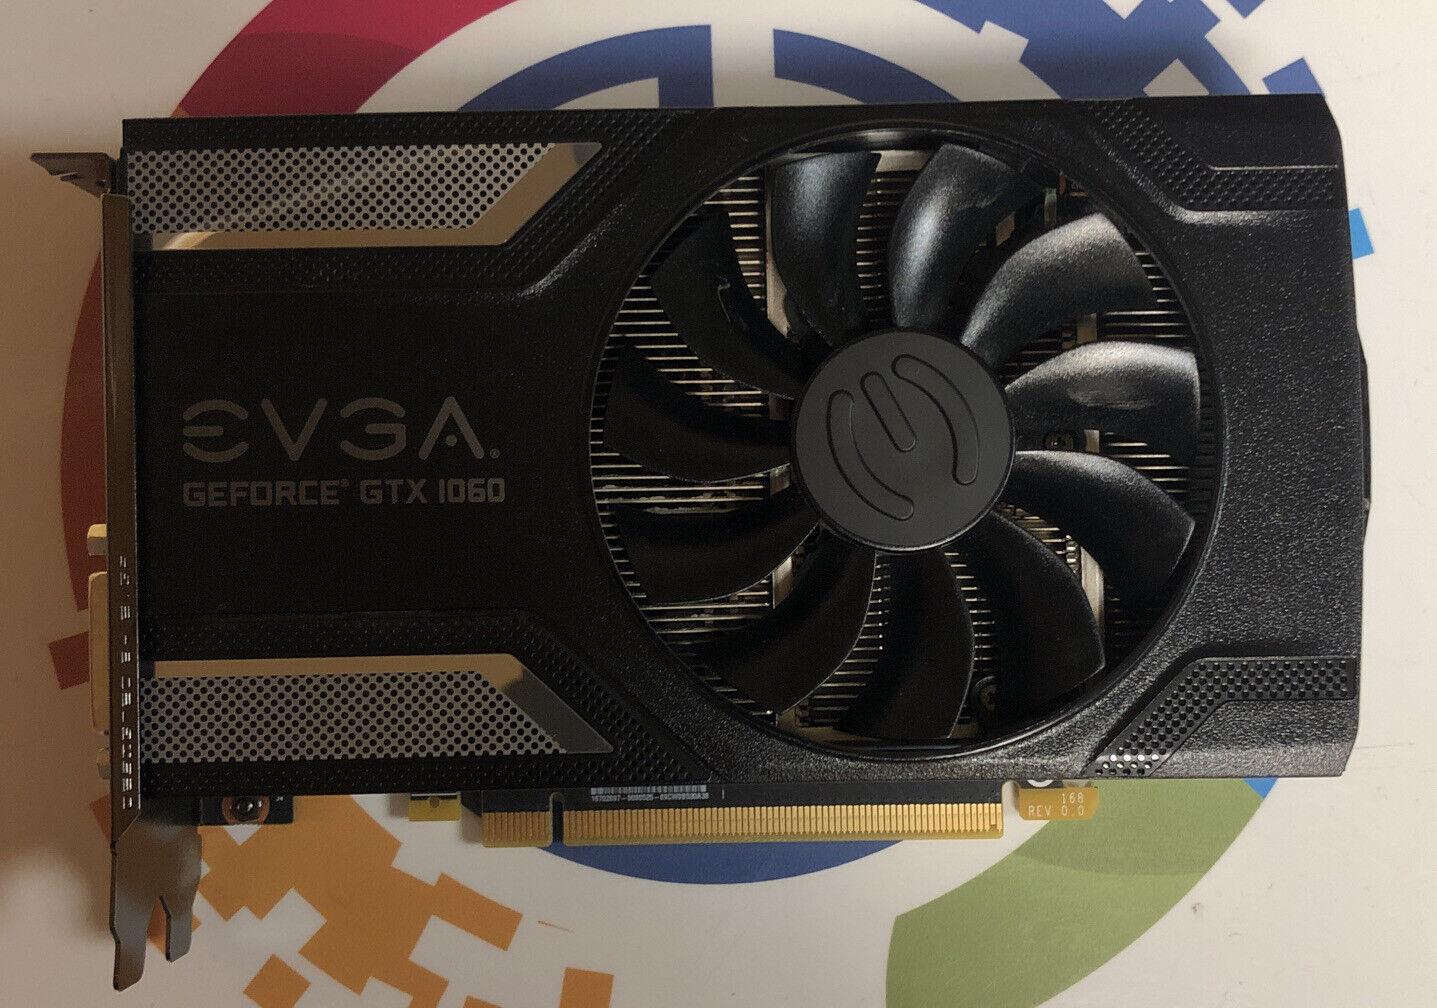 EVGA GeForce GTX 1060 3GB GDDR5 Graphics Card | 03G-P4-6162-KR